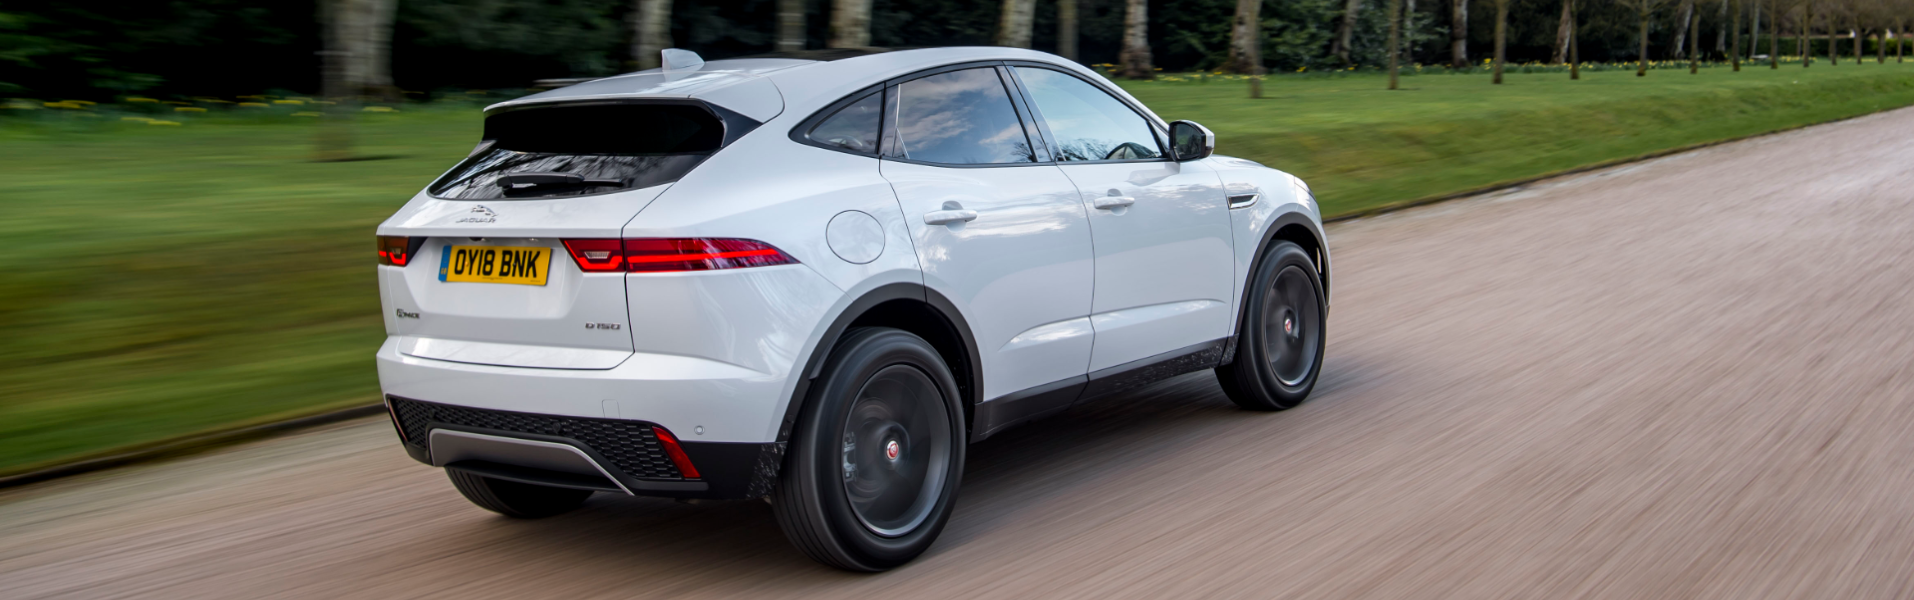 Jaguar E-PACE Handling